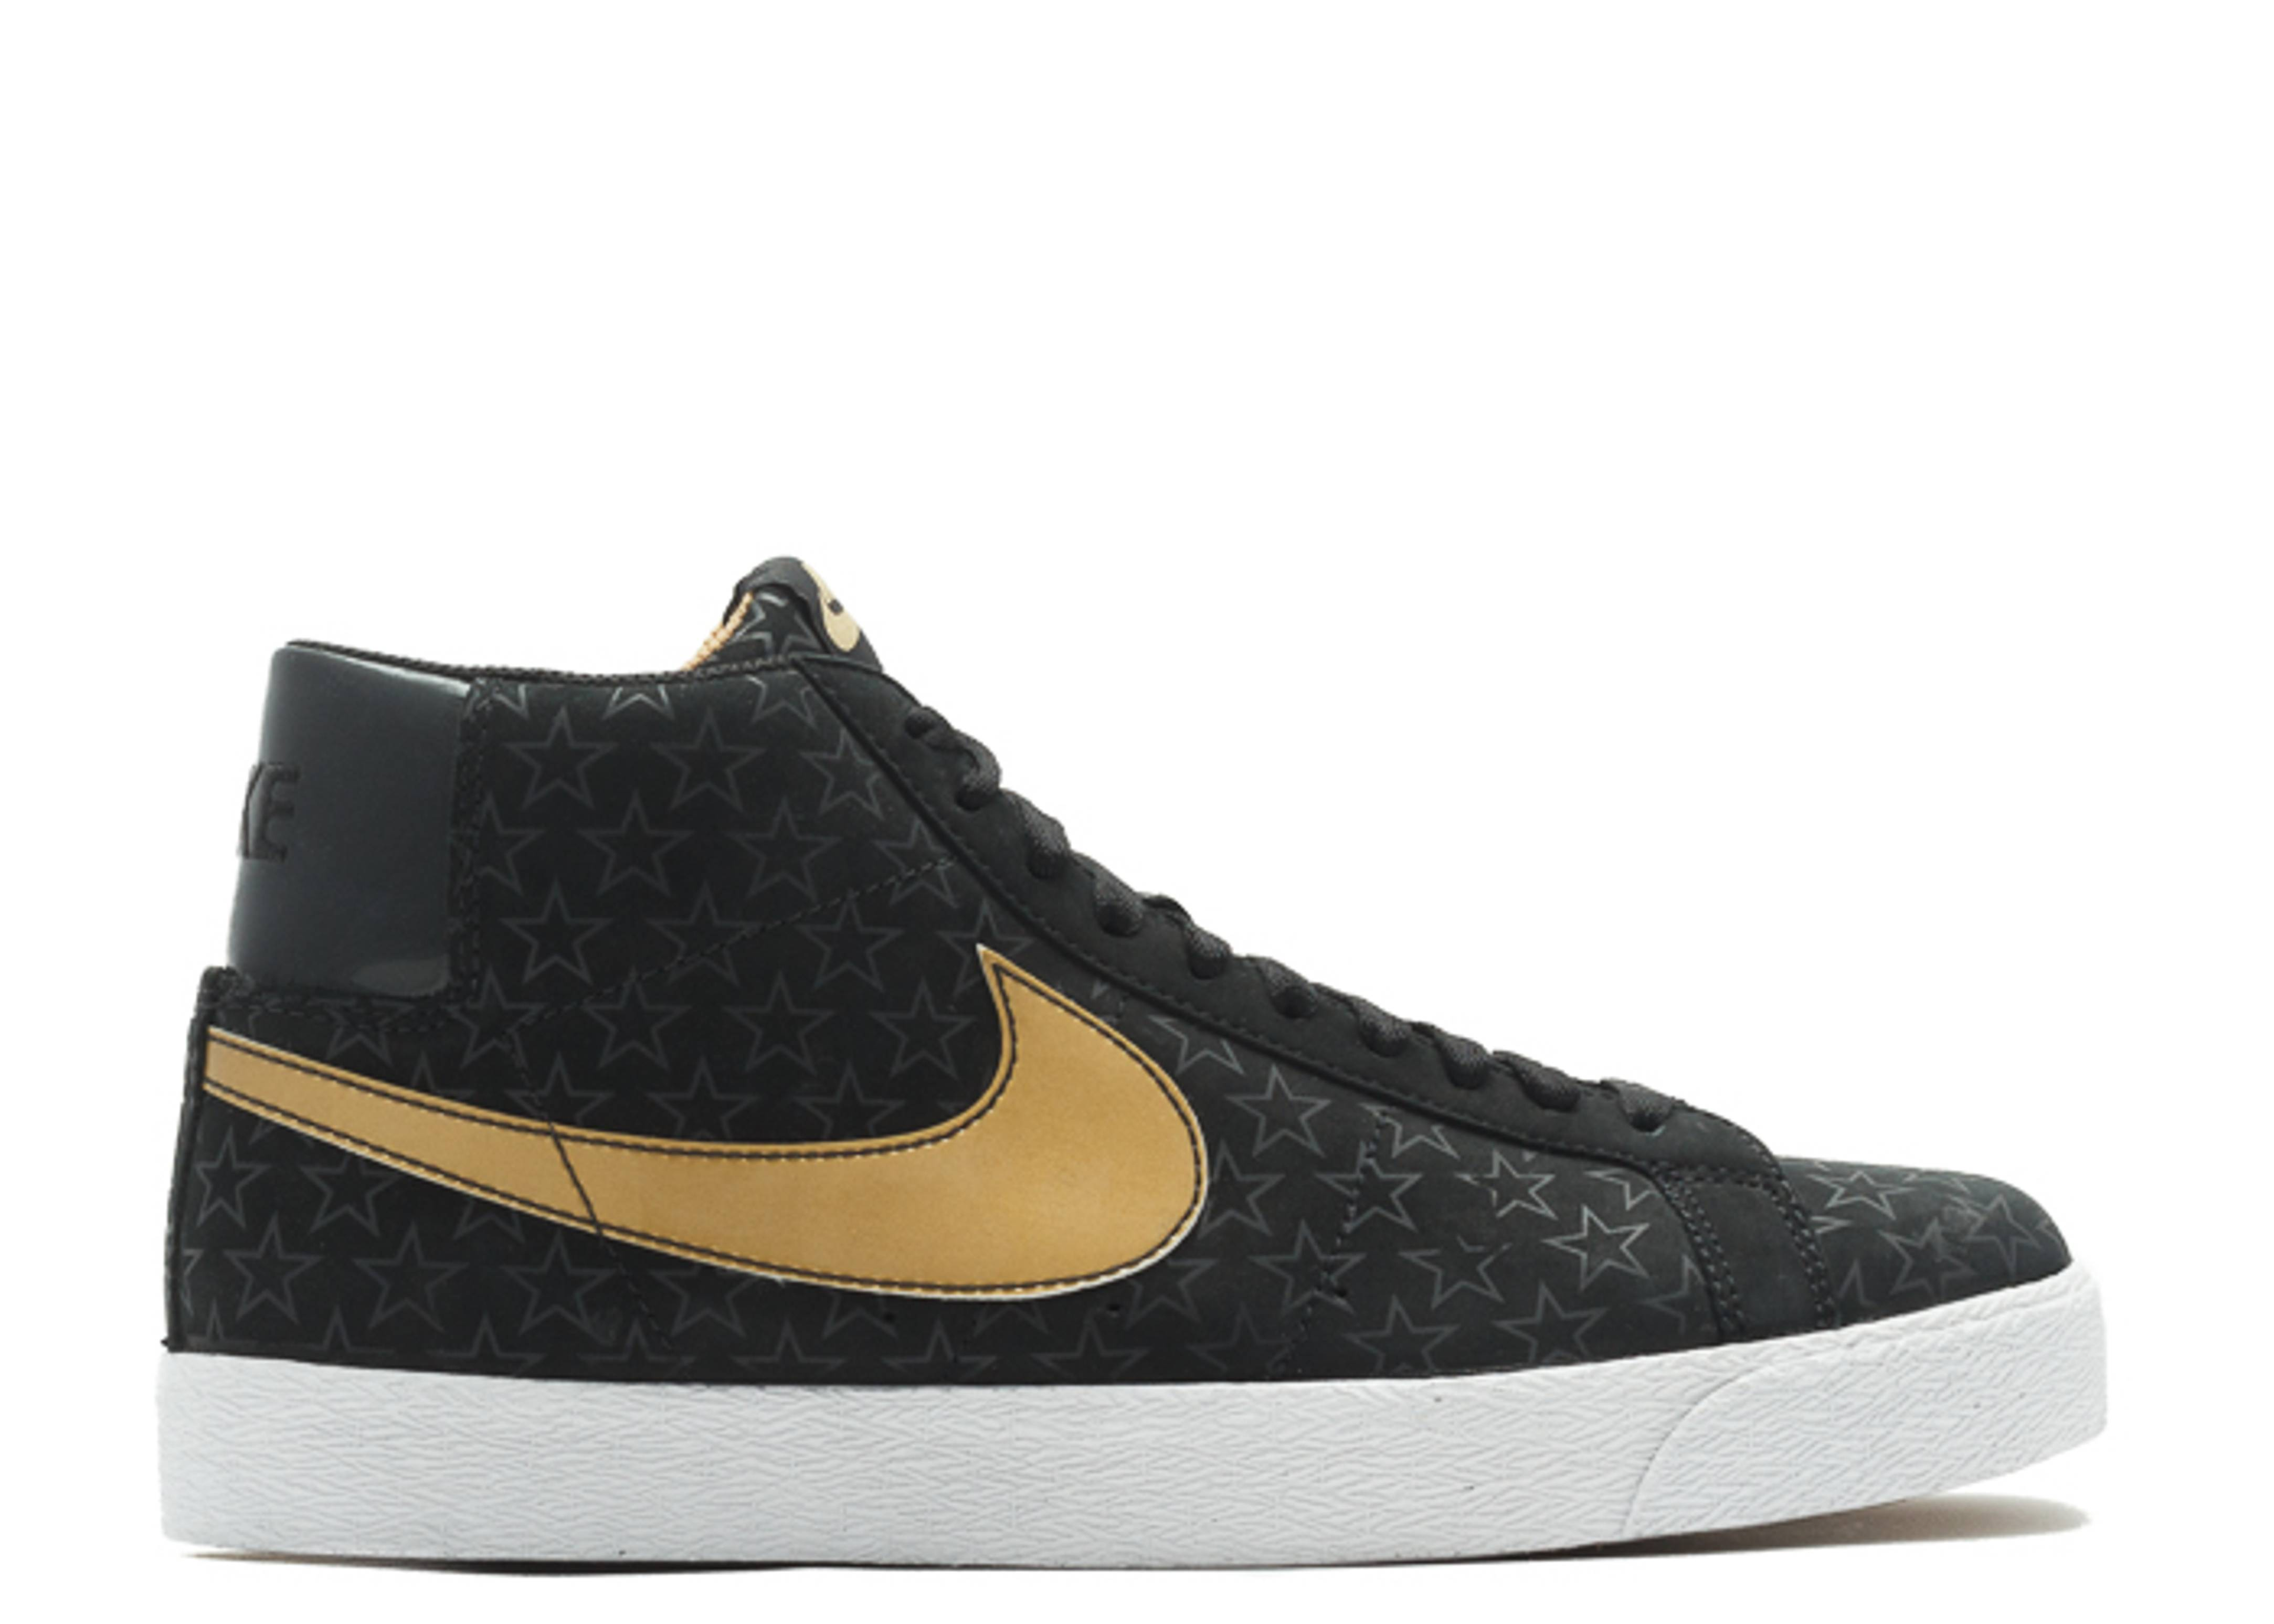 Nike SB Blazer Trickstar Sneakers (Black/Metallic Gold)